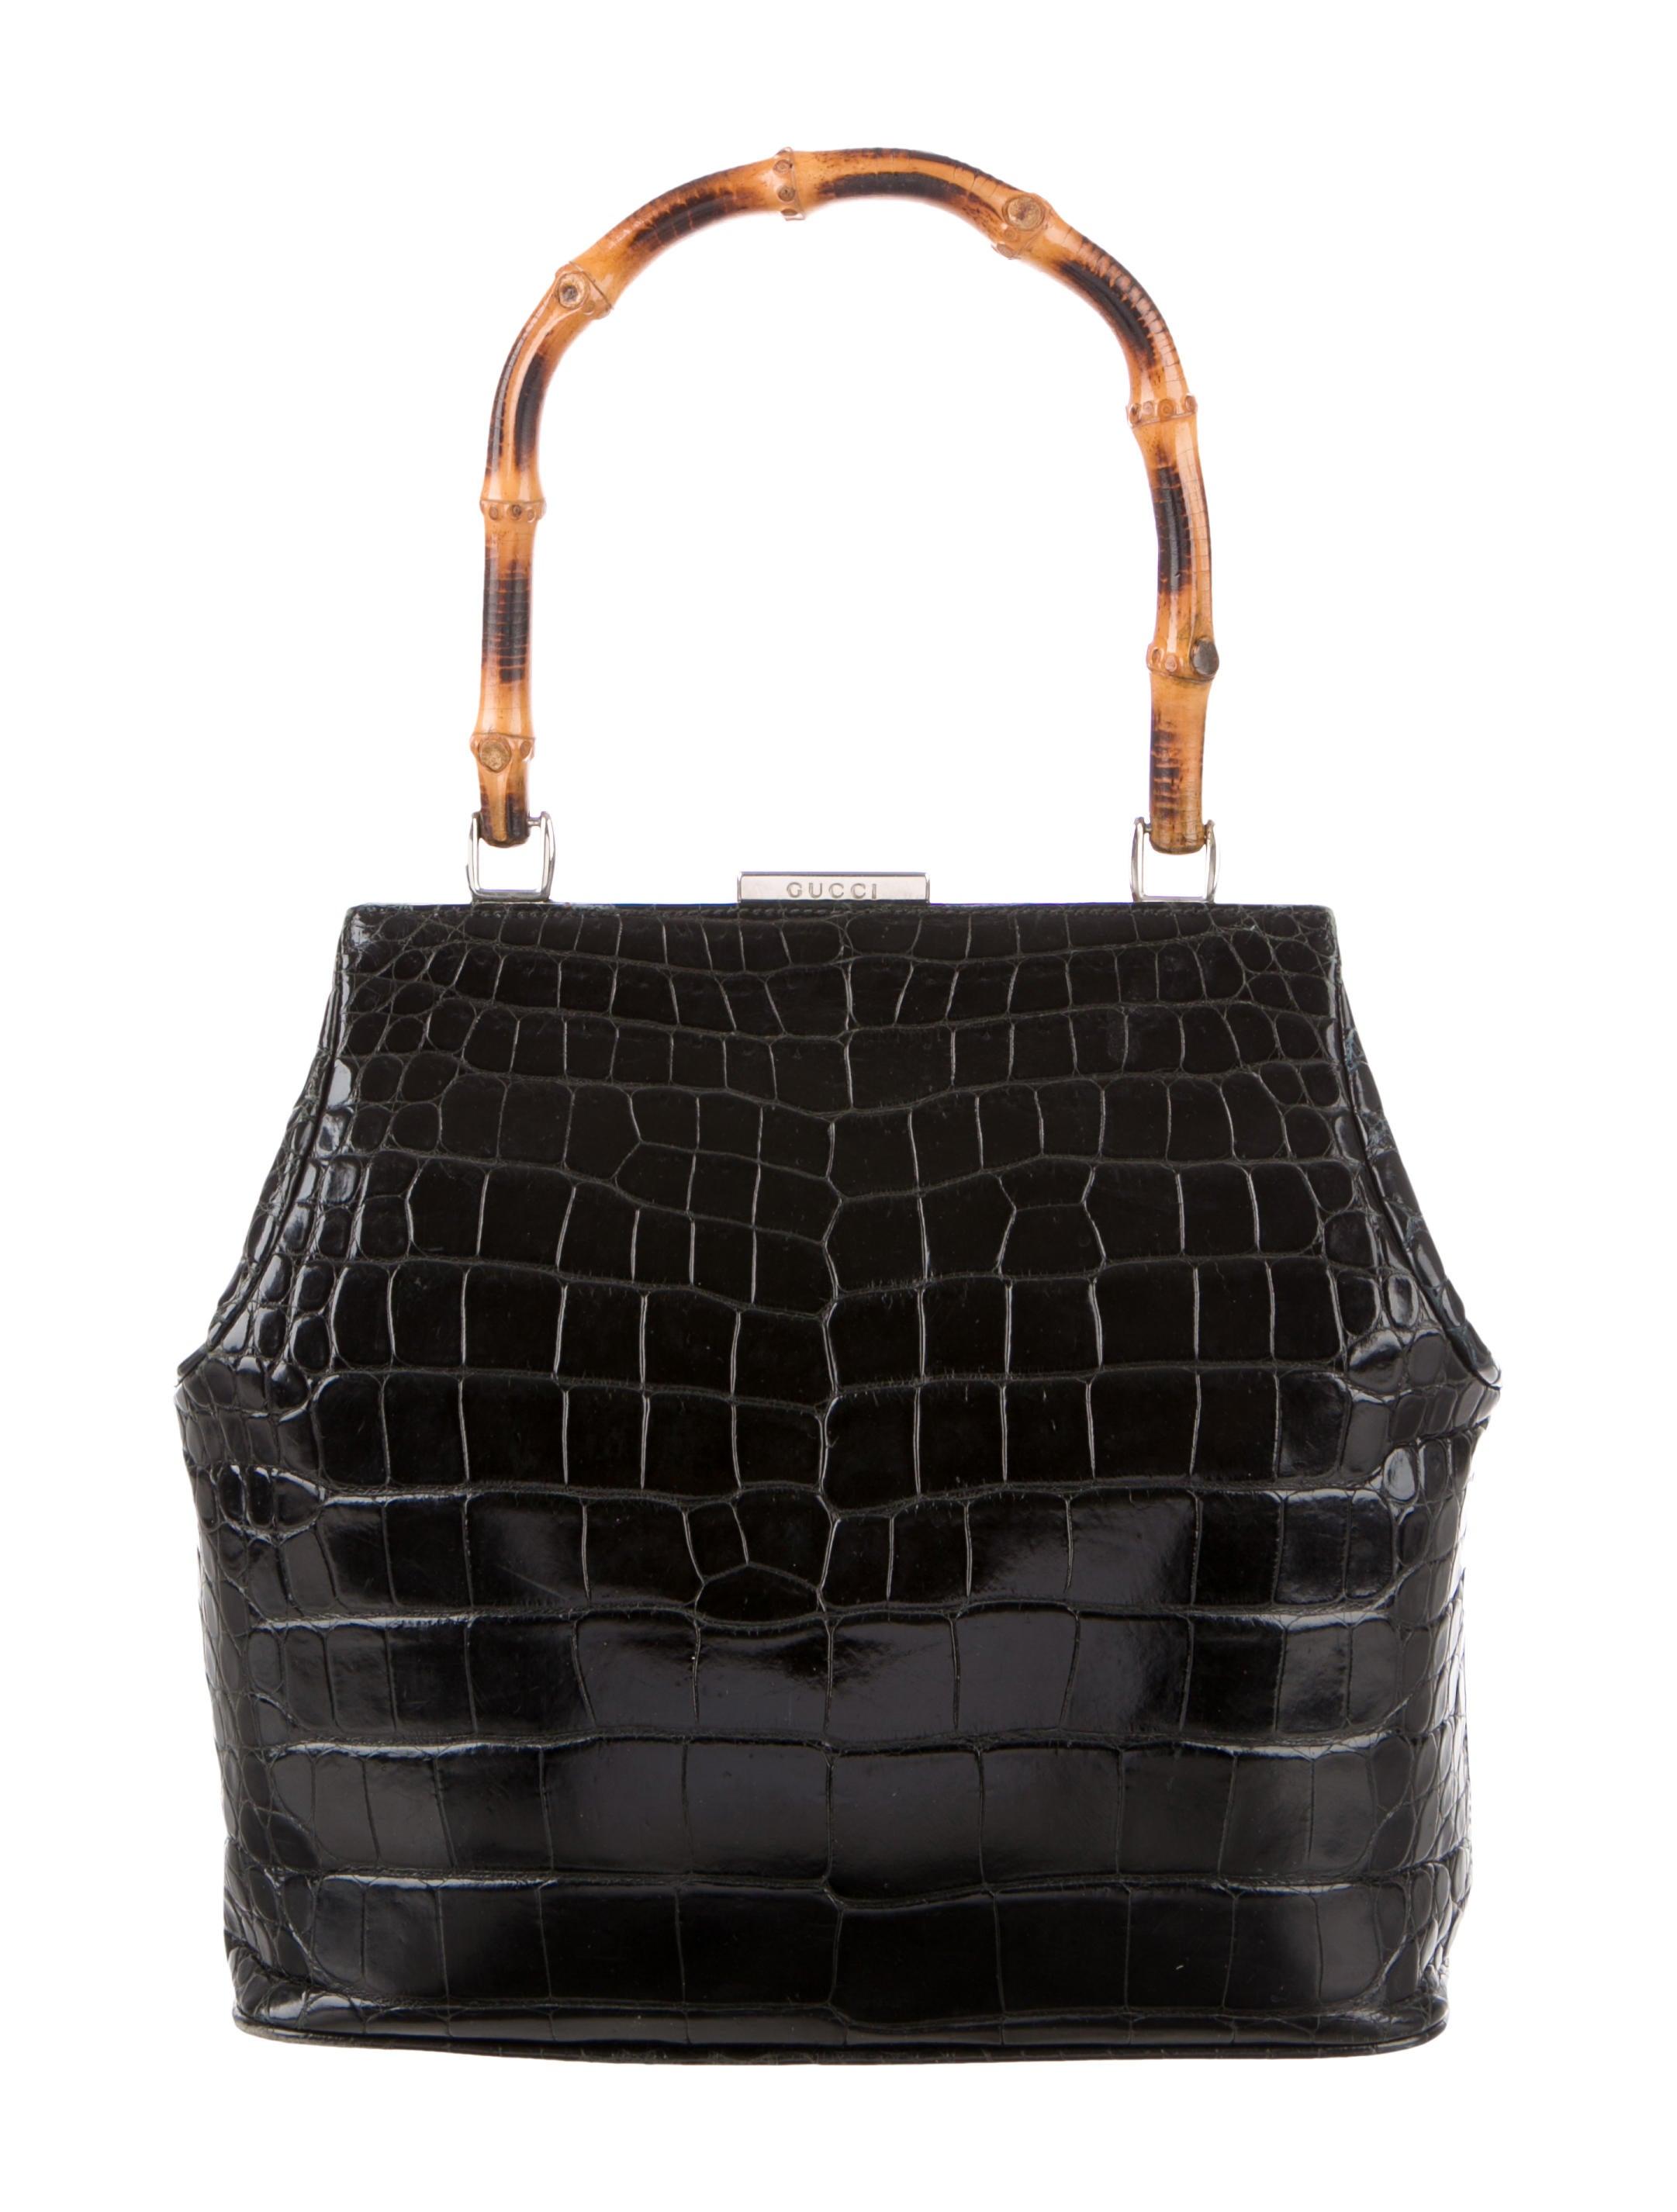 84589480b943 Gucci Vintage Crocodile Bamboo Top Handle Bag - Handbags - GUC228804 ...